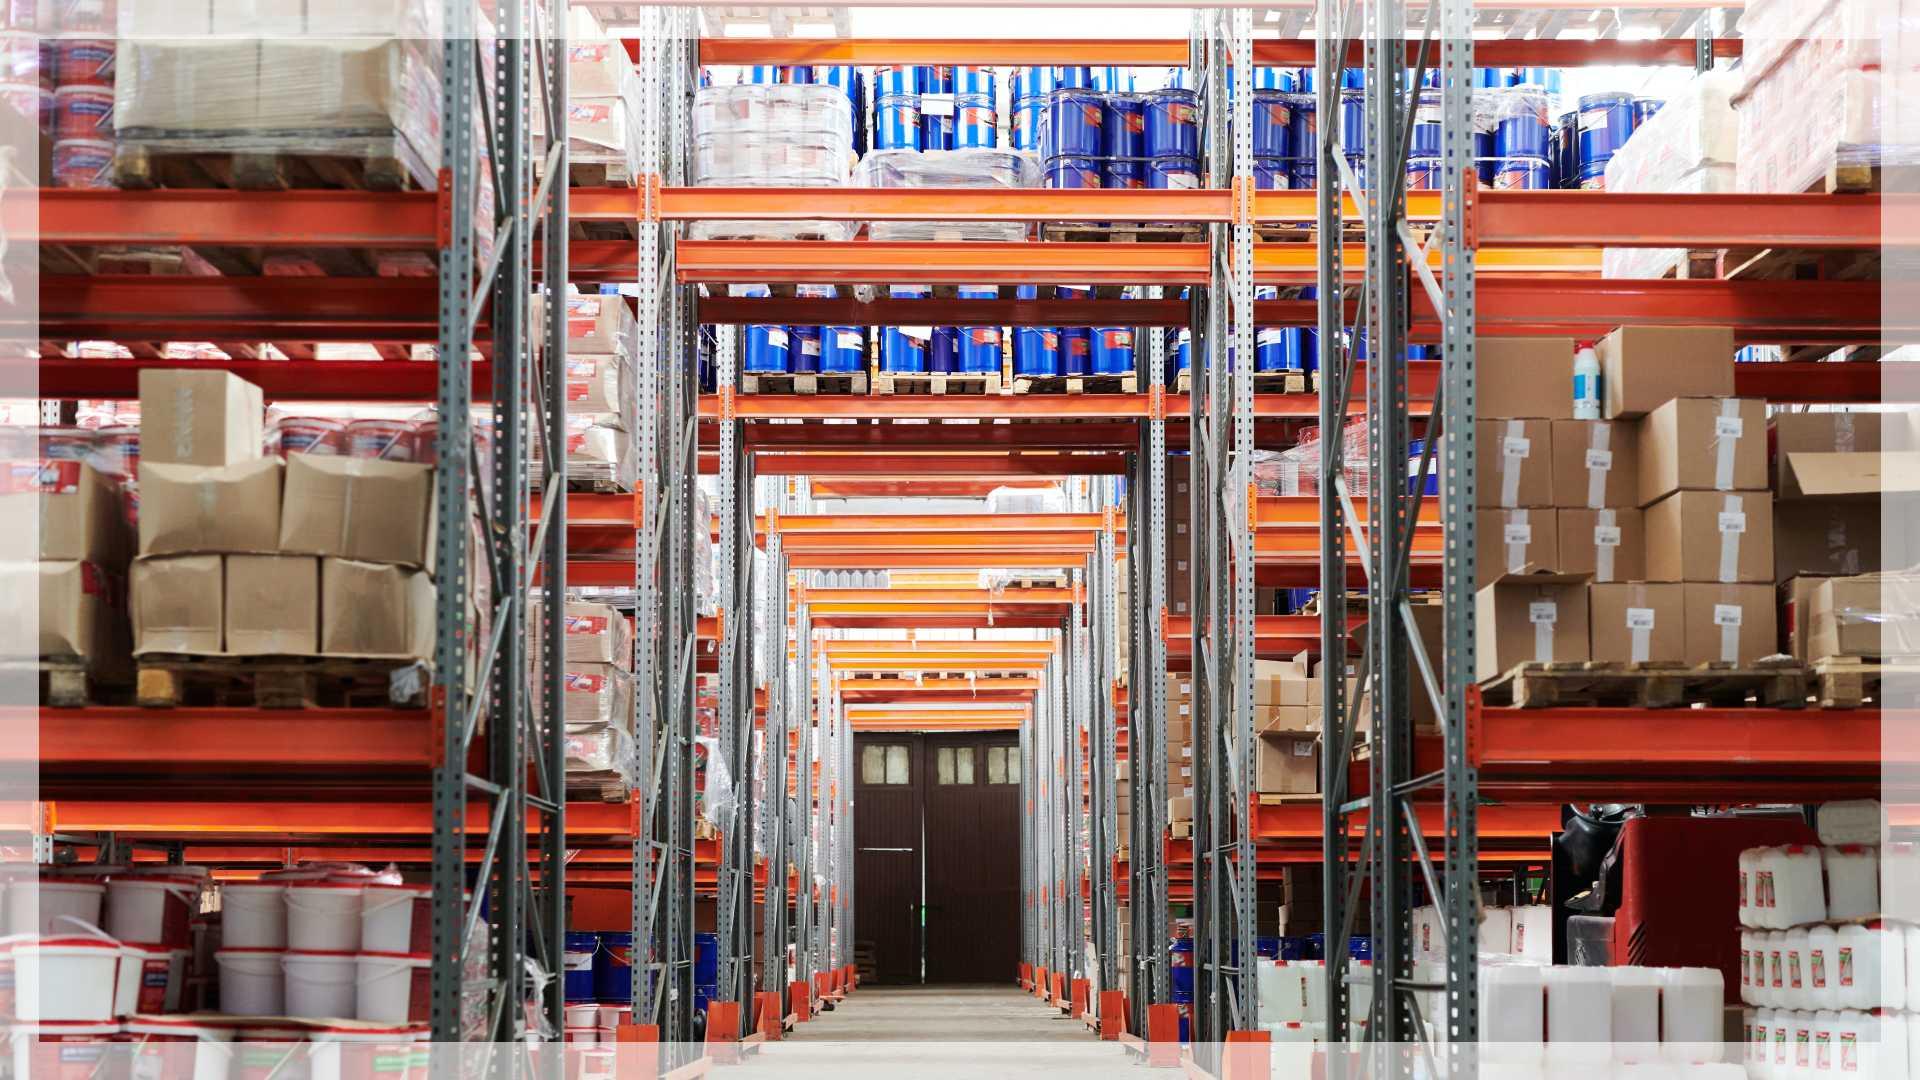 inventory-optimization-and-management-training